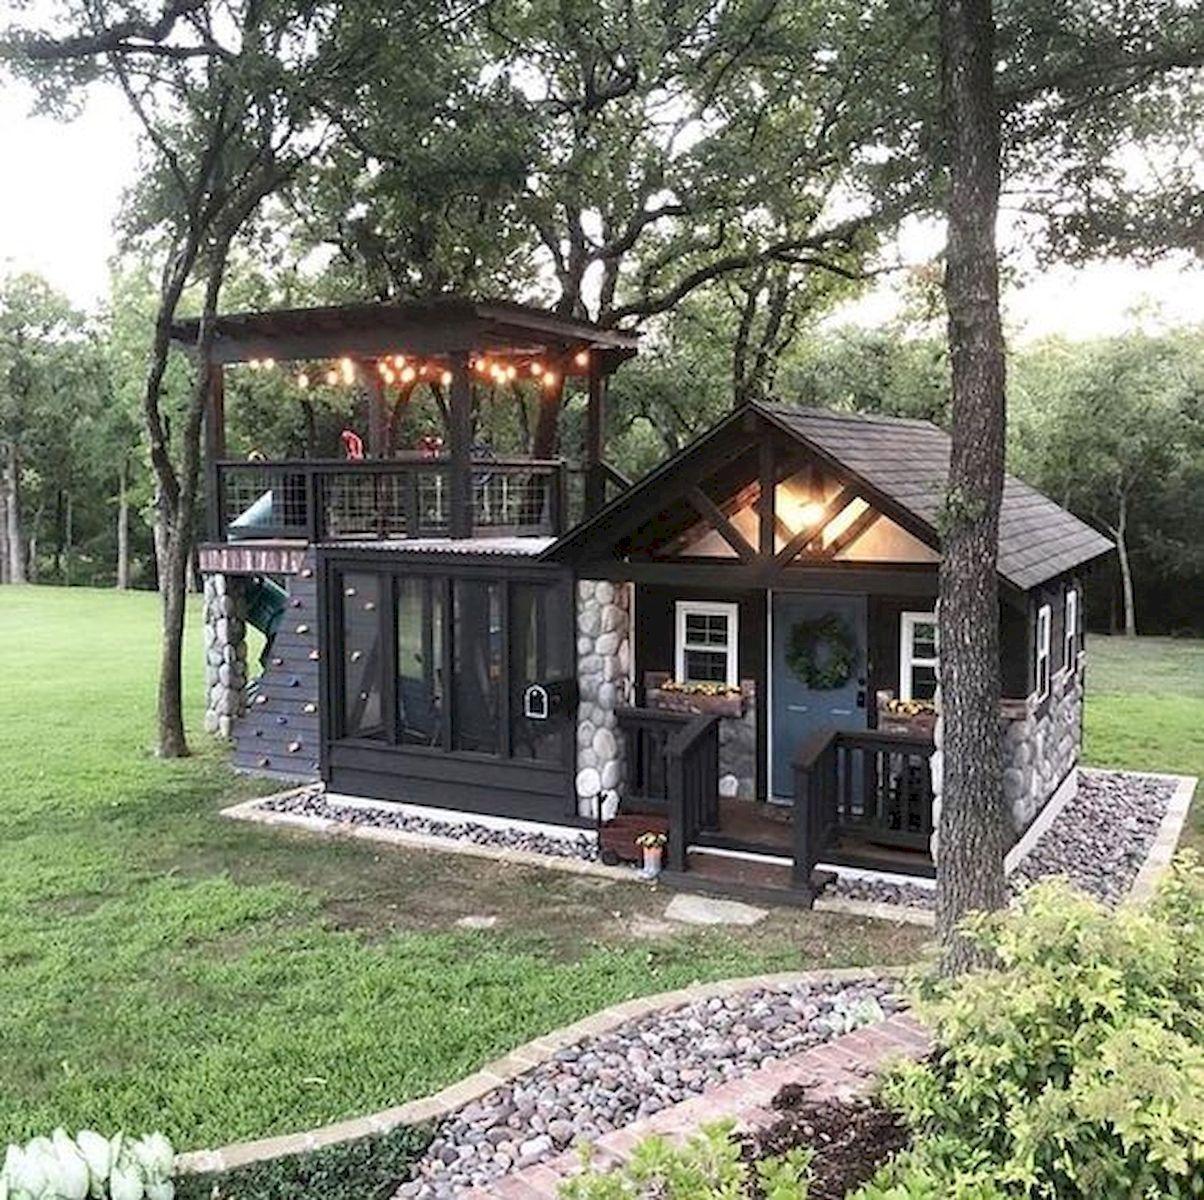 60 Adorable Farmhouse Cottage Design Ideas And Decor 1